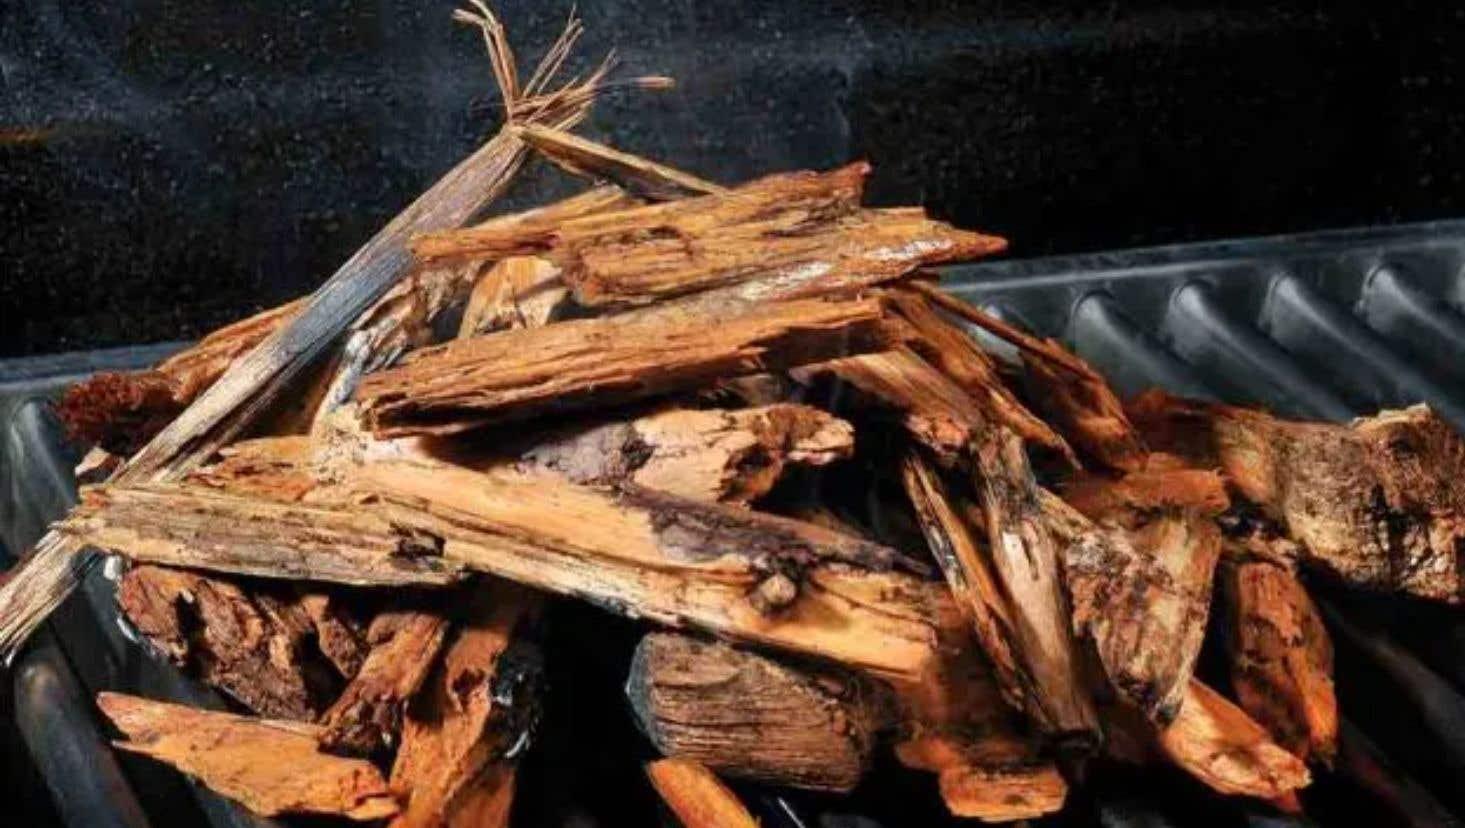 Smoking Wood Flavors